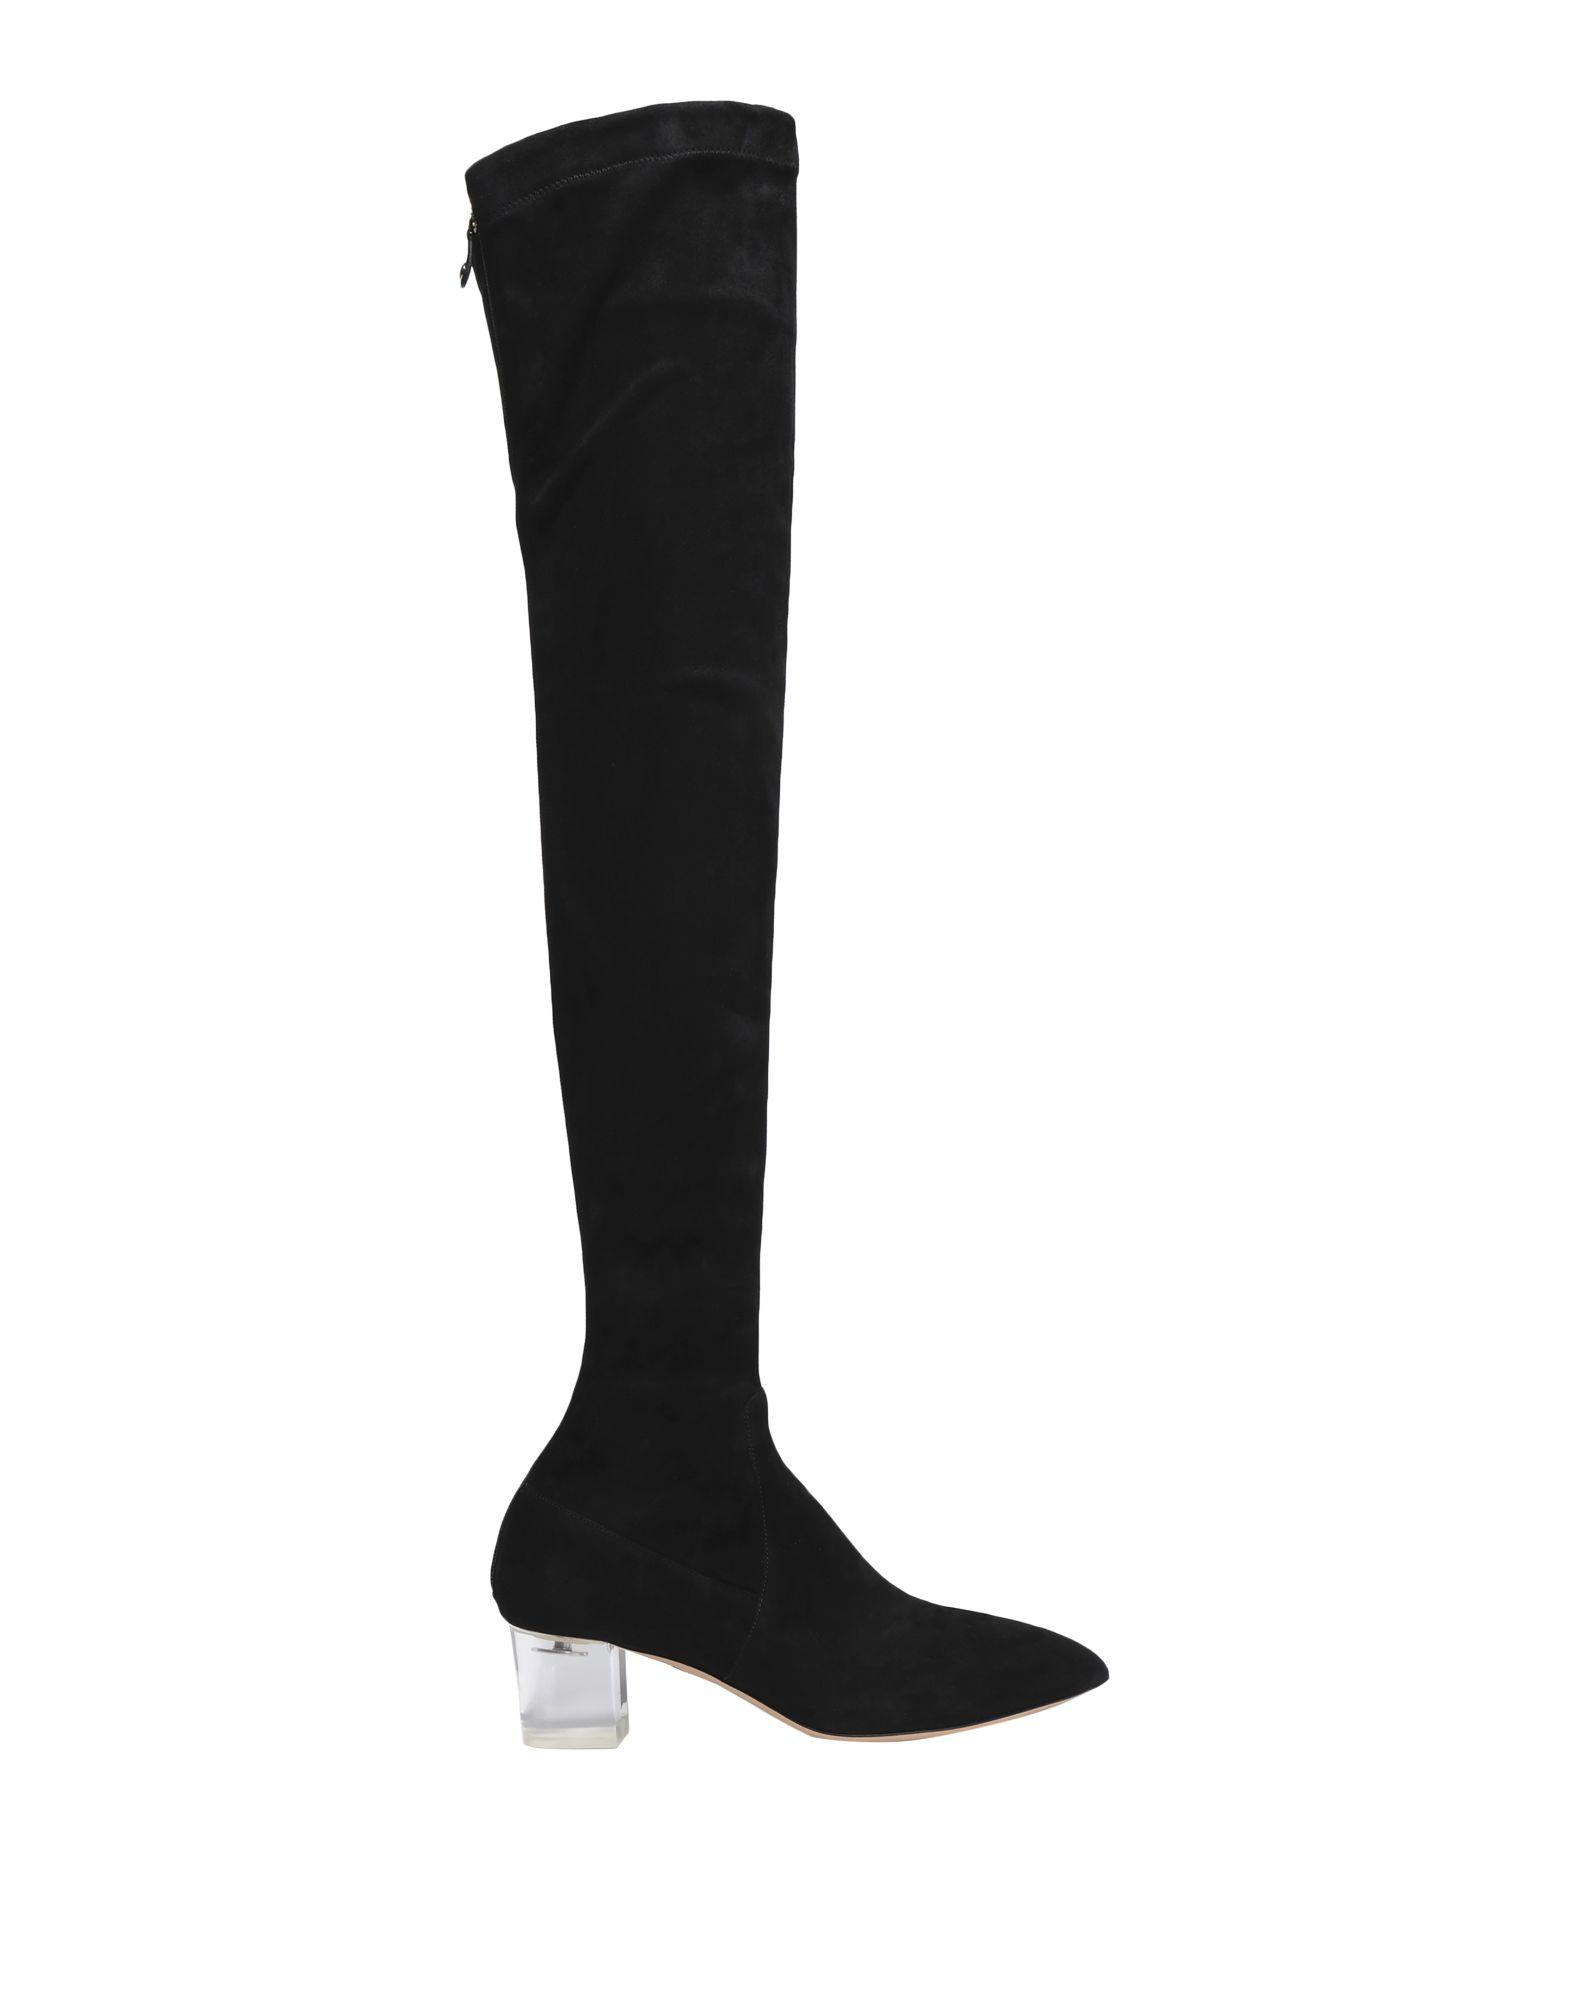 Charlotte Charlotte Olympia Boots - Women Charlotte Charlotte Olympia Boots online on  Canada - 11272885RG 77d8c7